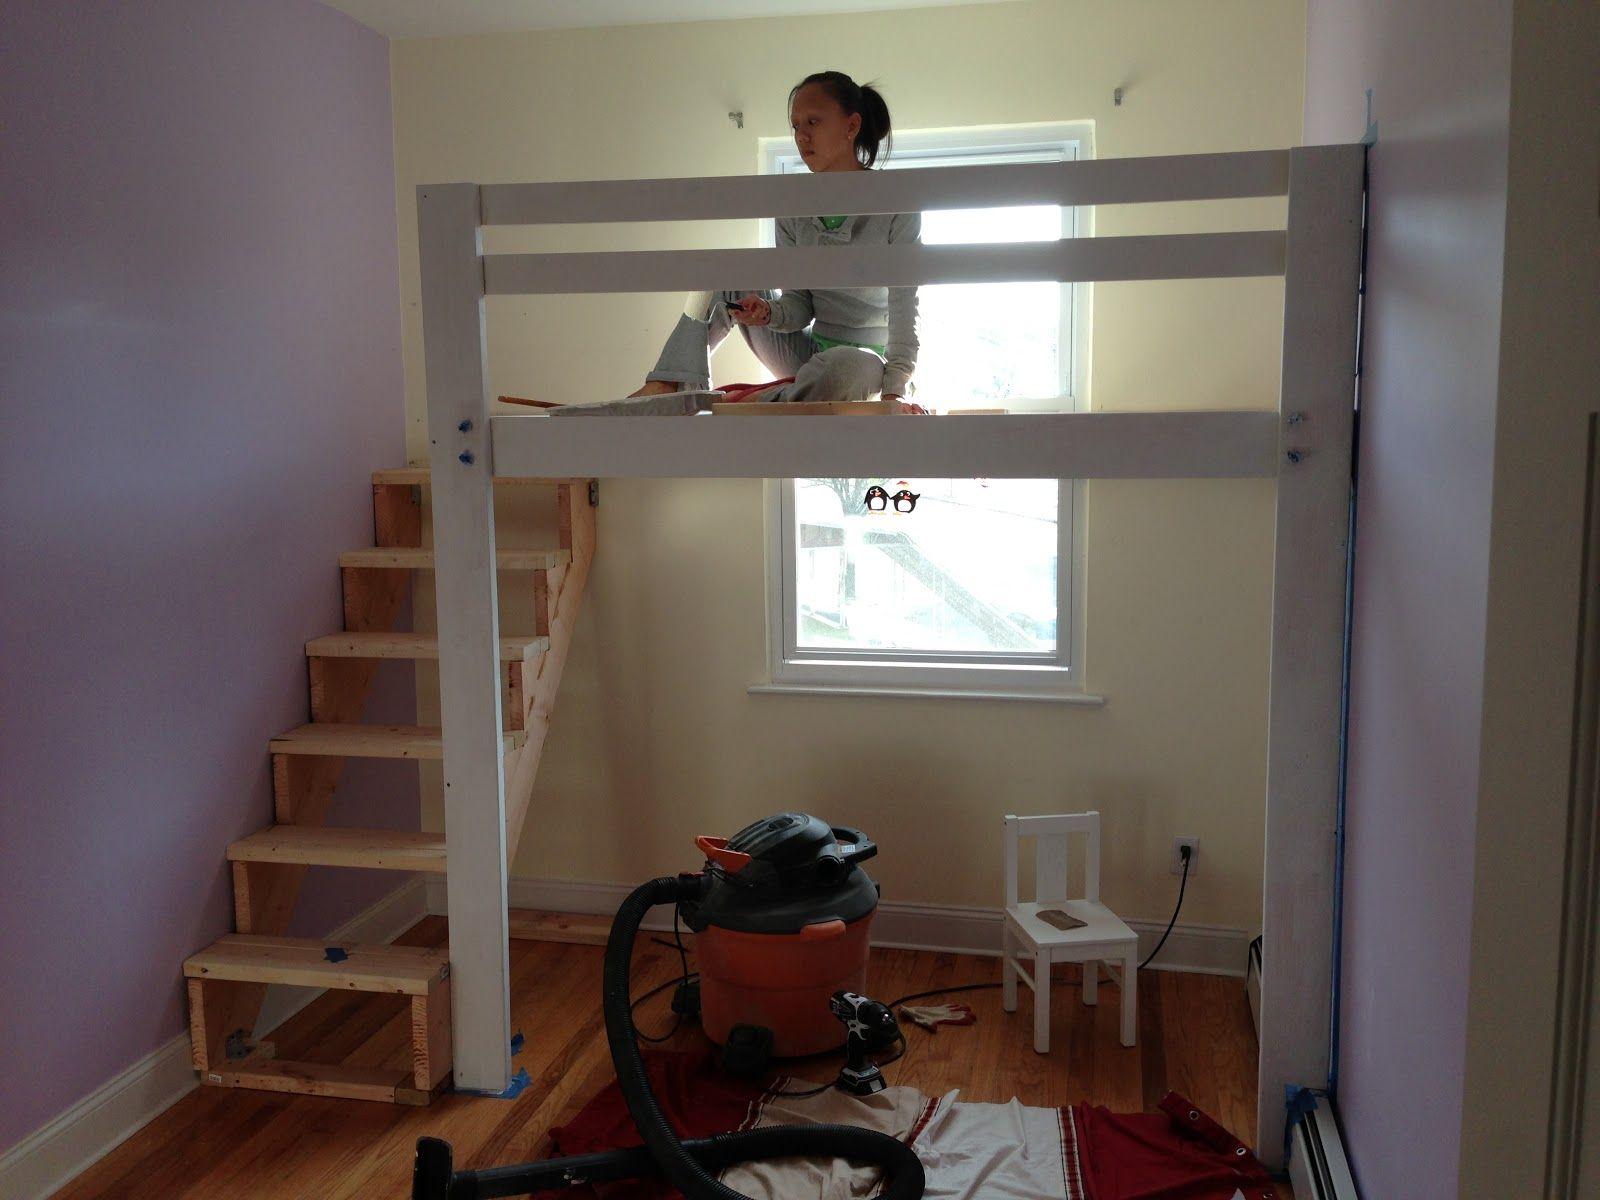 Loft bed ideas for kids  IMGJPG   mas tarde  Pinterest  Bunk bed Lofts